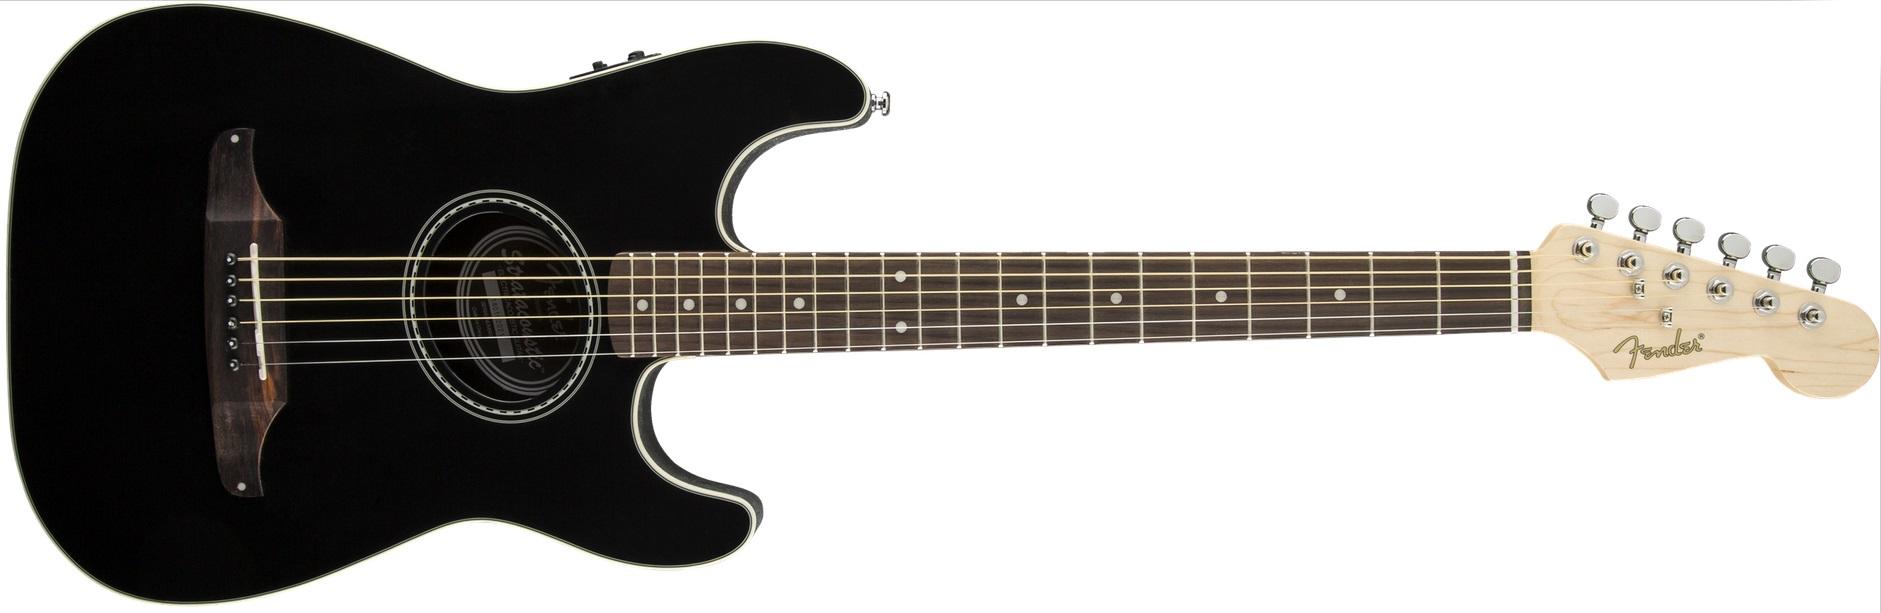 Fender Standard Stratacoustic BK